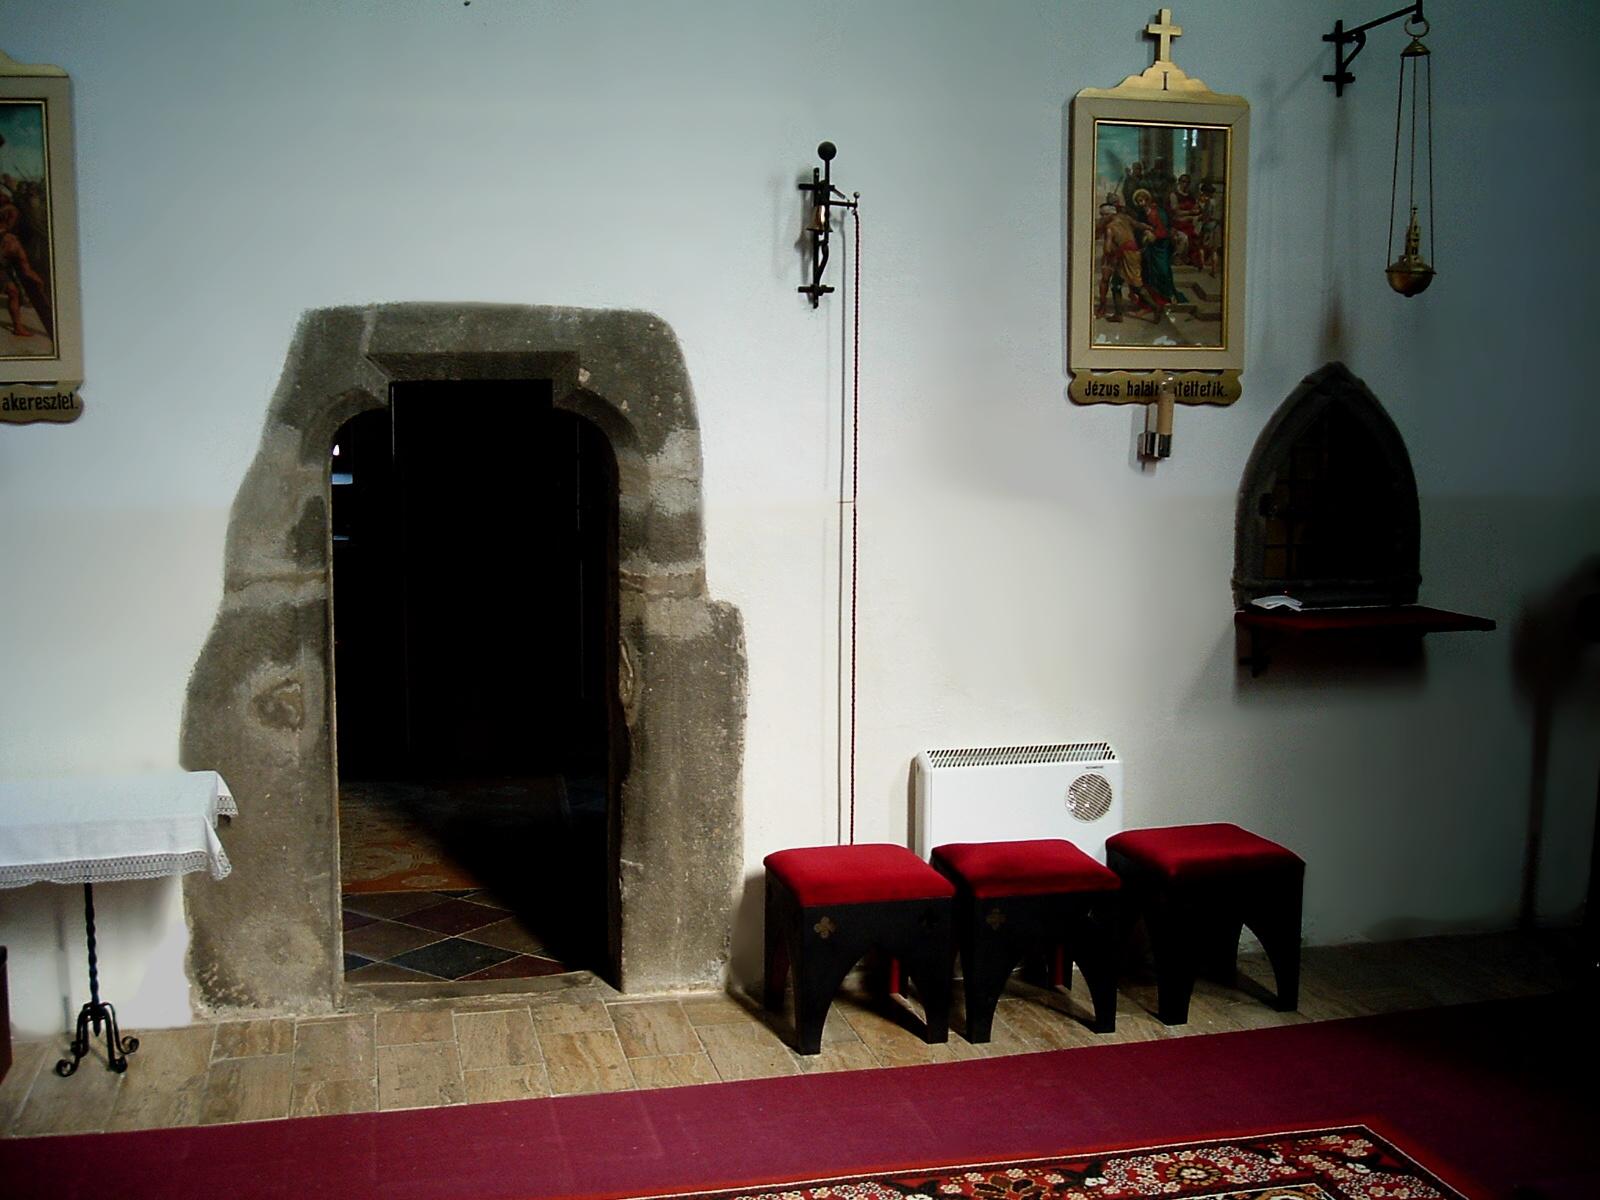 Súbor kostol – interiér